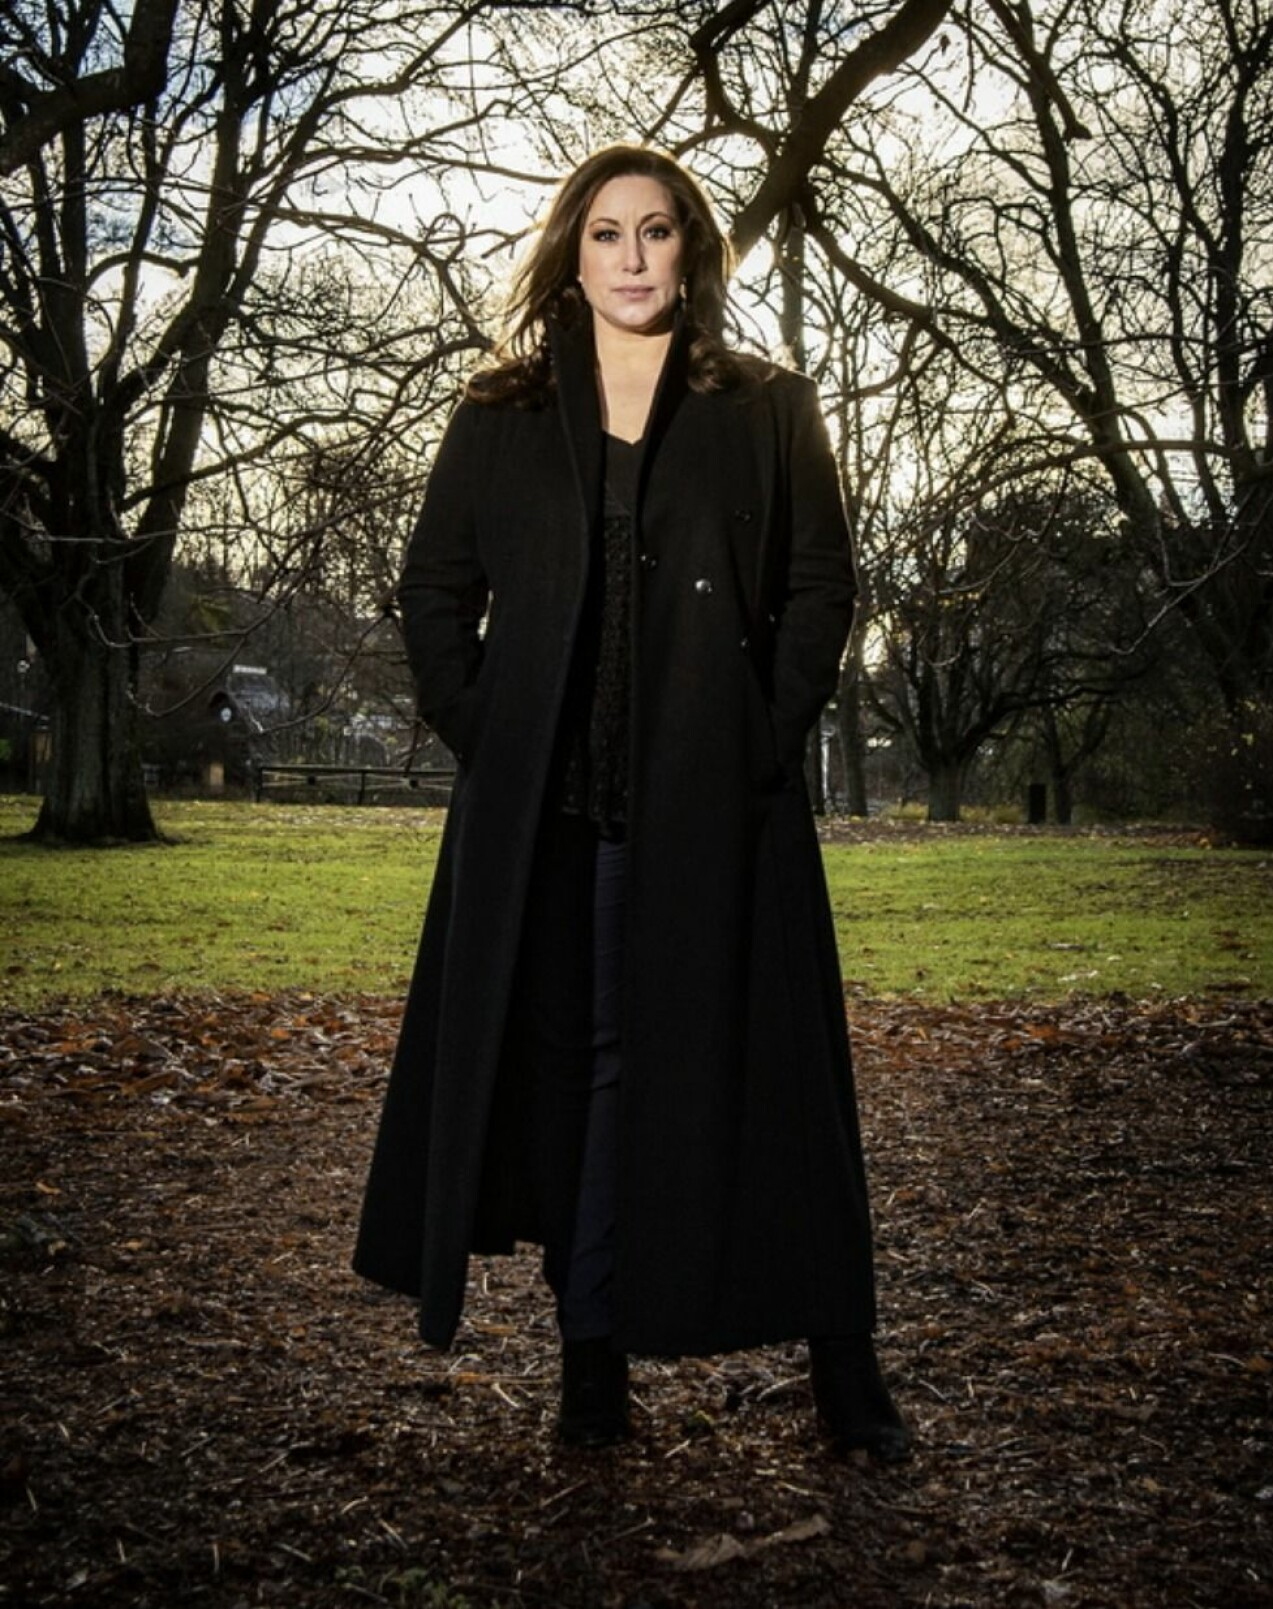 Lisa Nilsson står bland lite träd